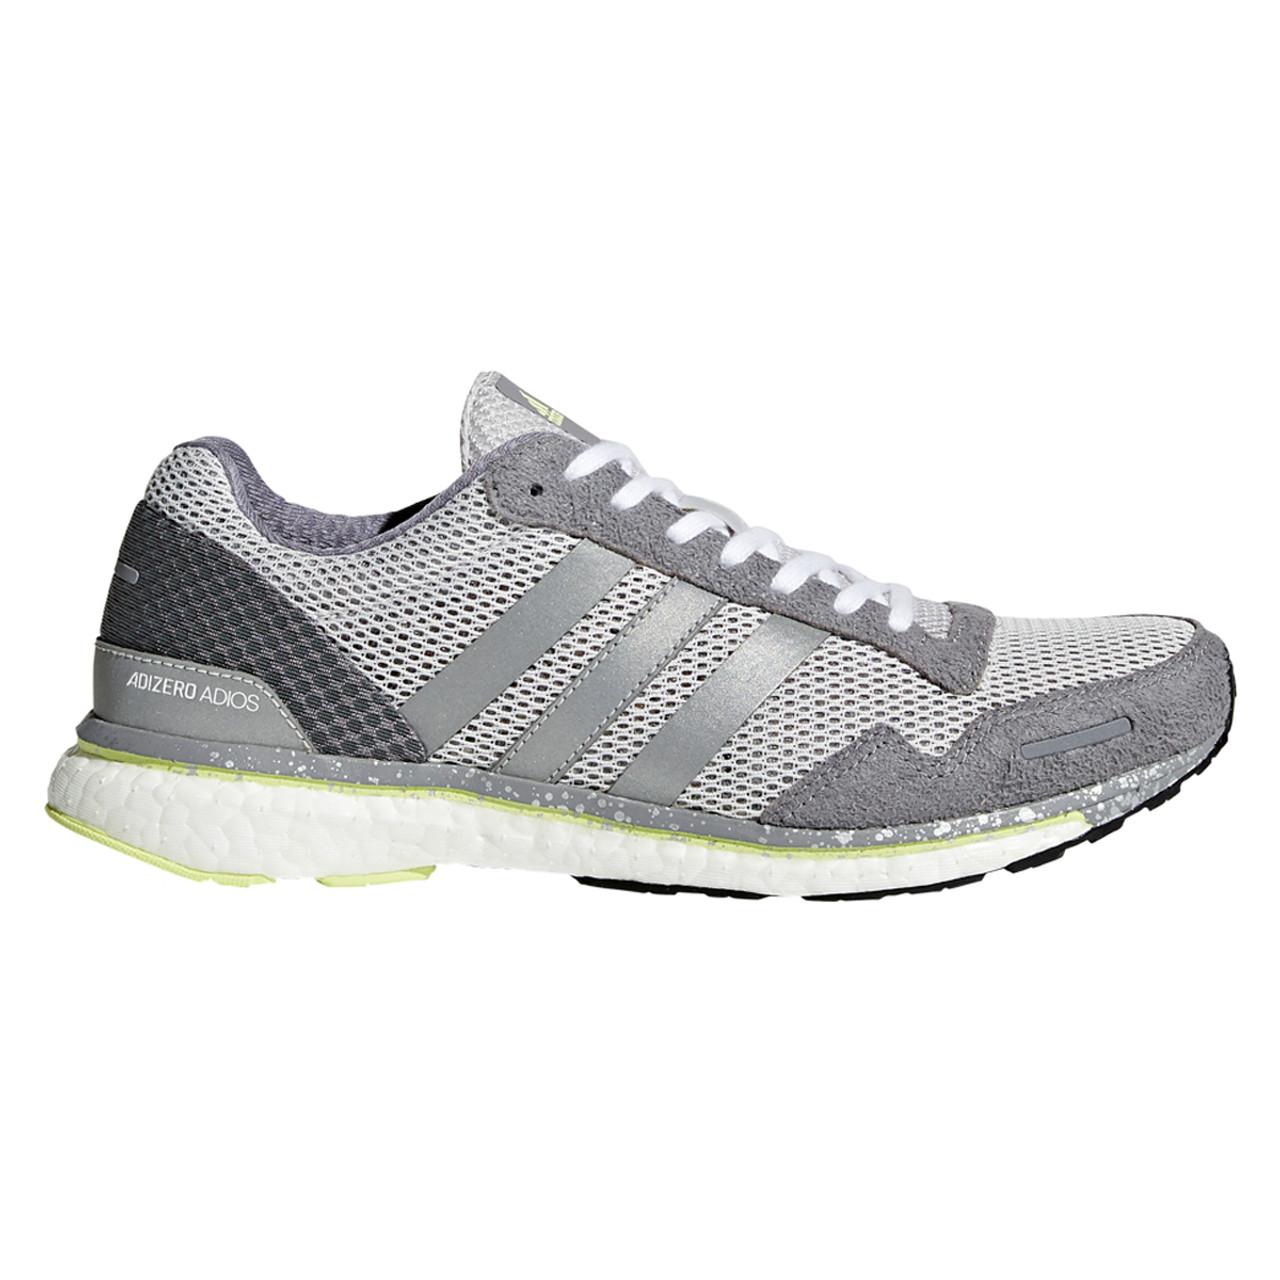 muy agradable conseguir barato alta moda Adidas Adizero Adios 3 Womens Sneakers BB6410 - Silver